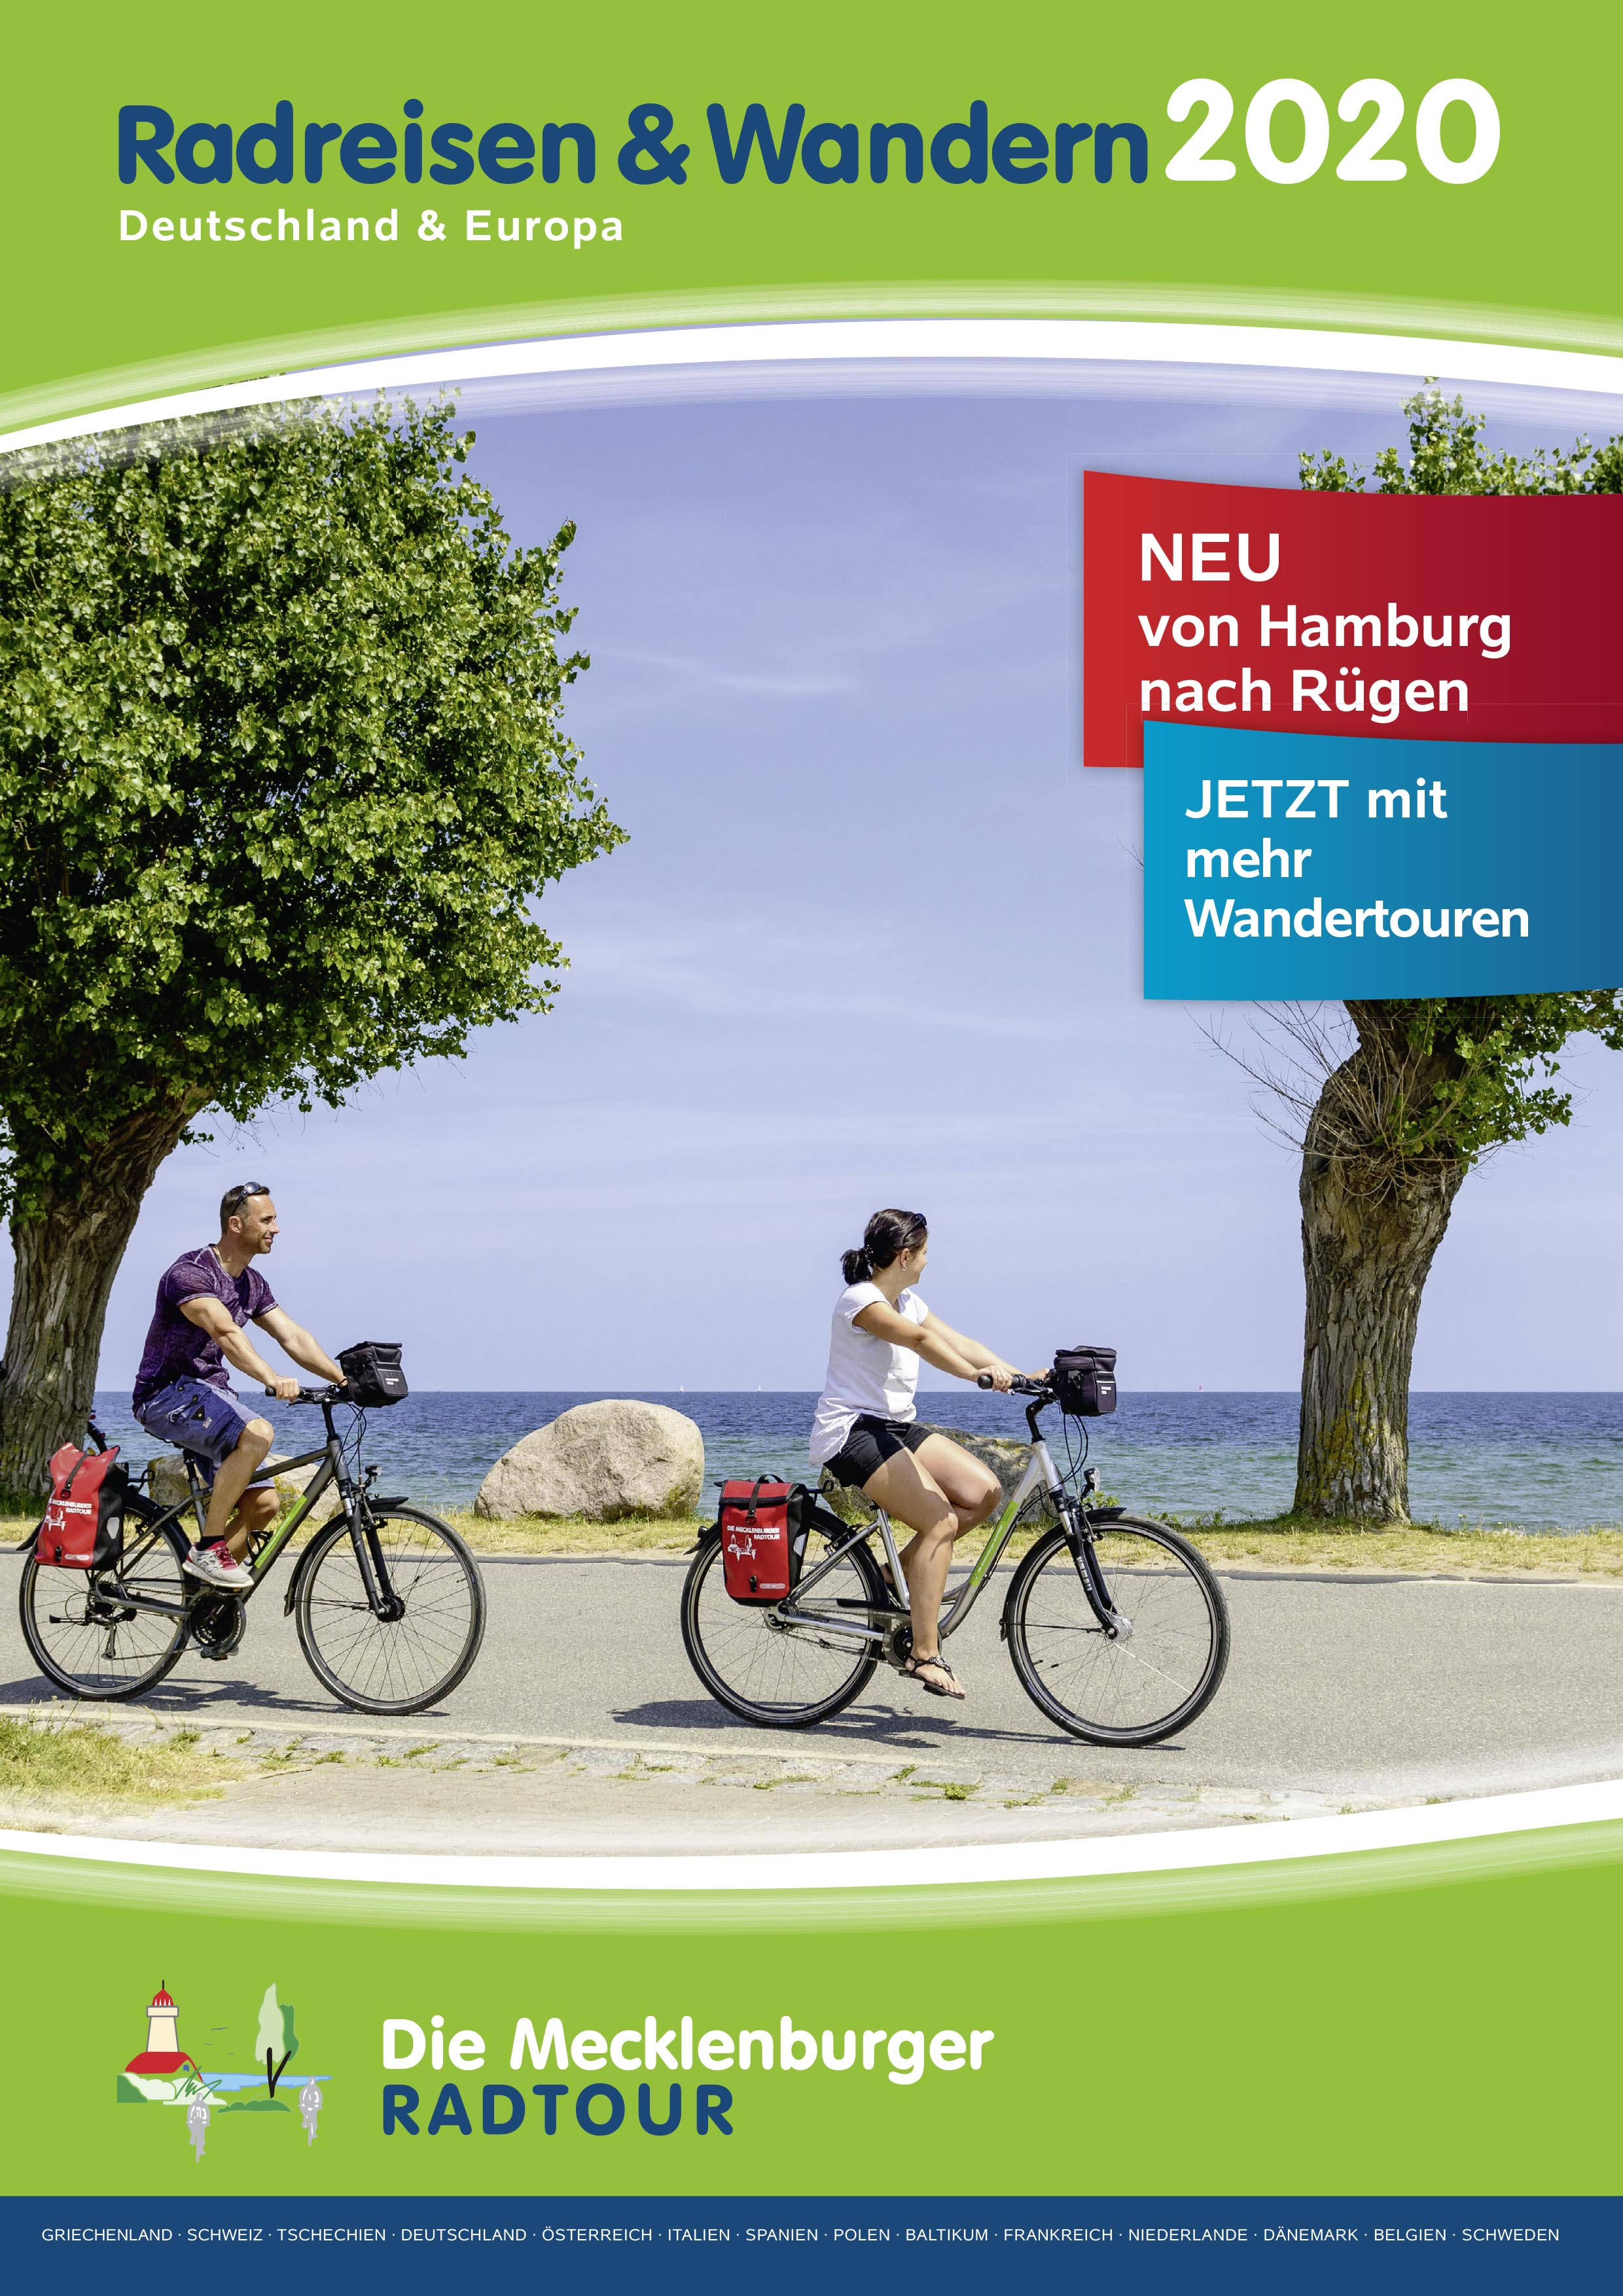 Mecklenburger Radtour 300 Km